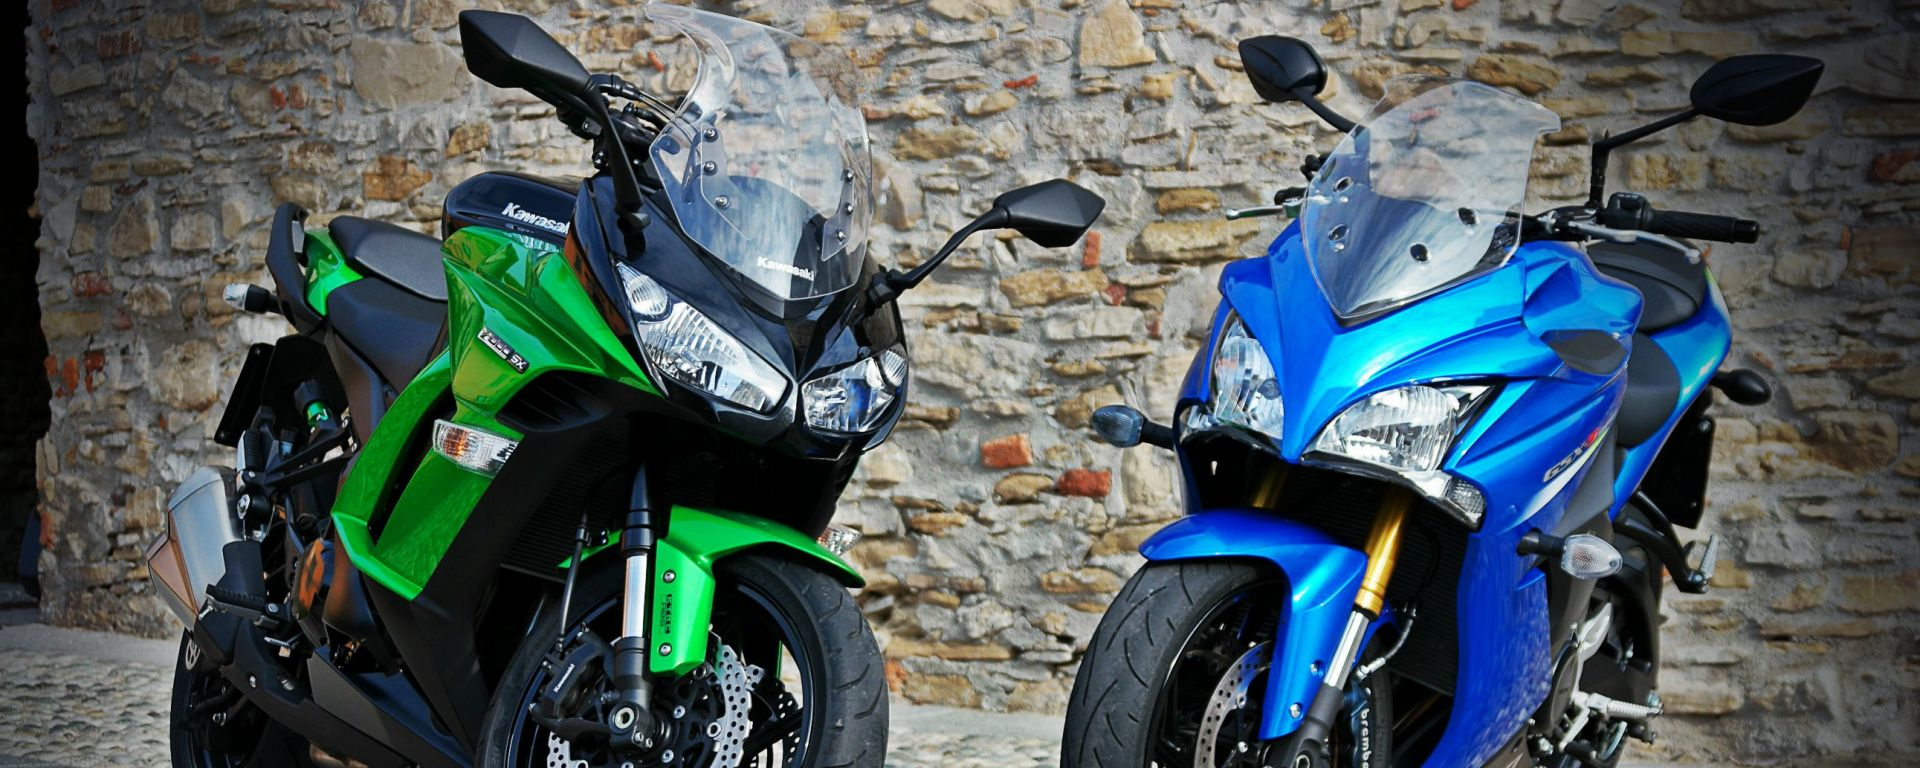 Kawasaki Z1000SX vs Suzuki GSX-S1000F